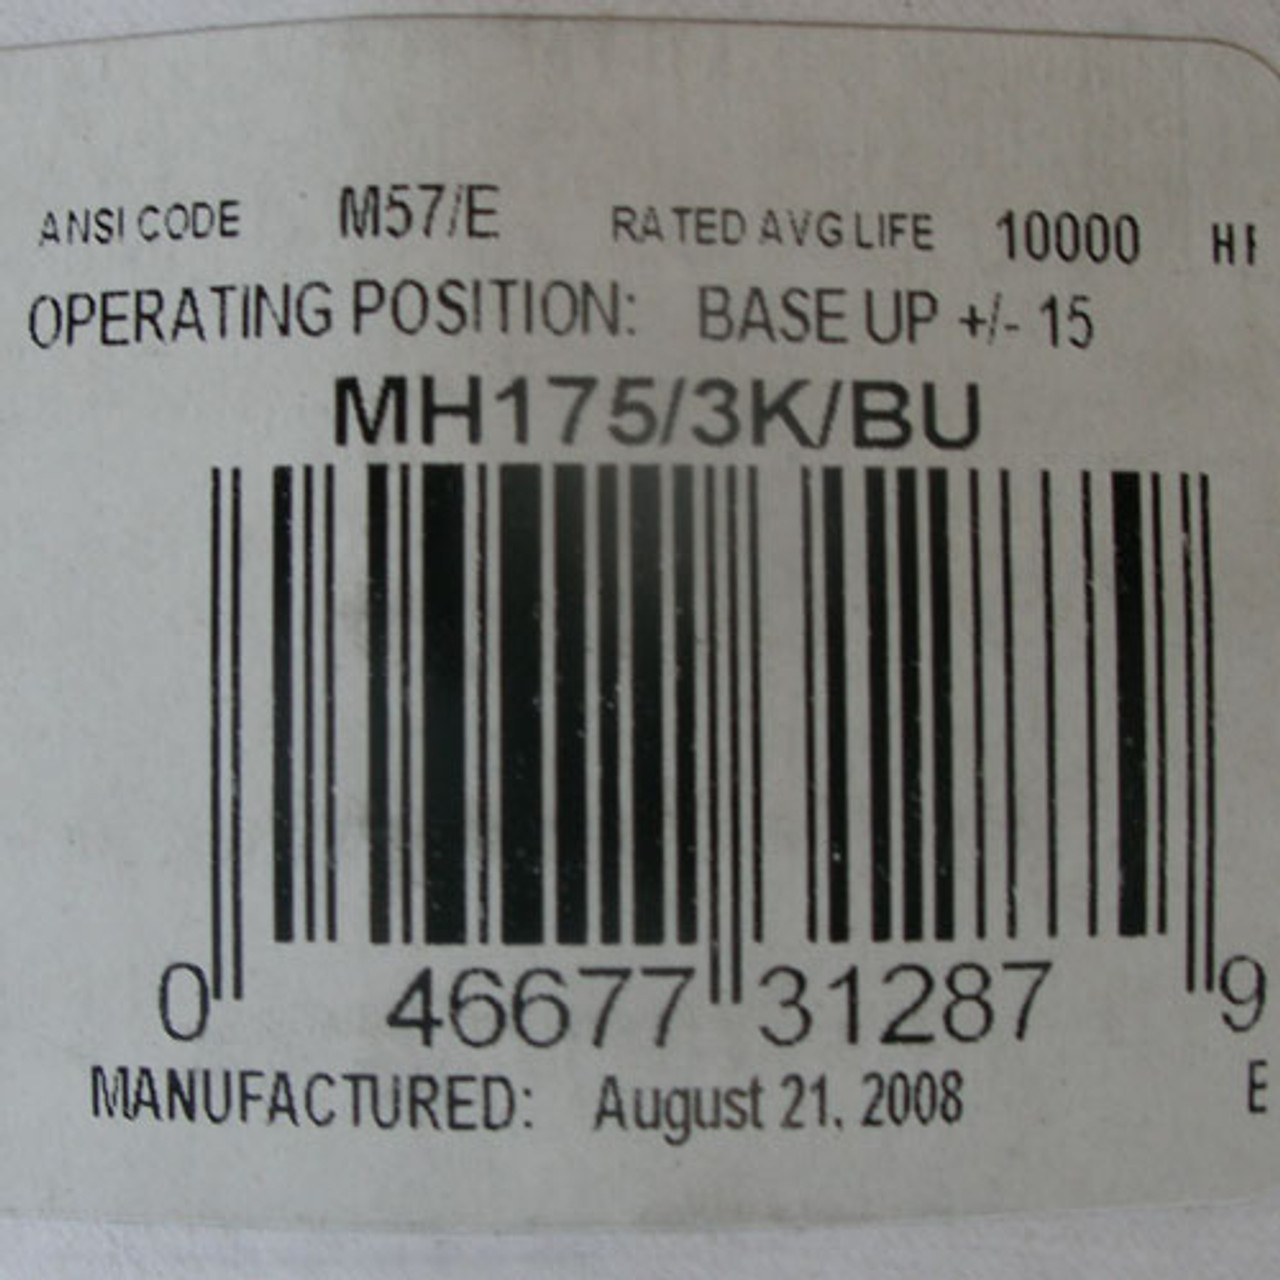 Philips MH175/3K/BU 175 Watt Metal Halide Light Bulb